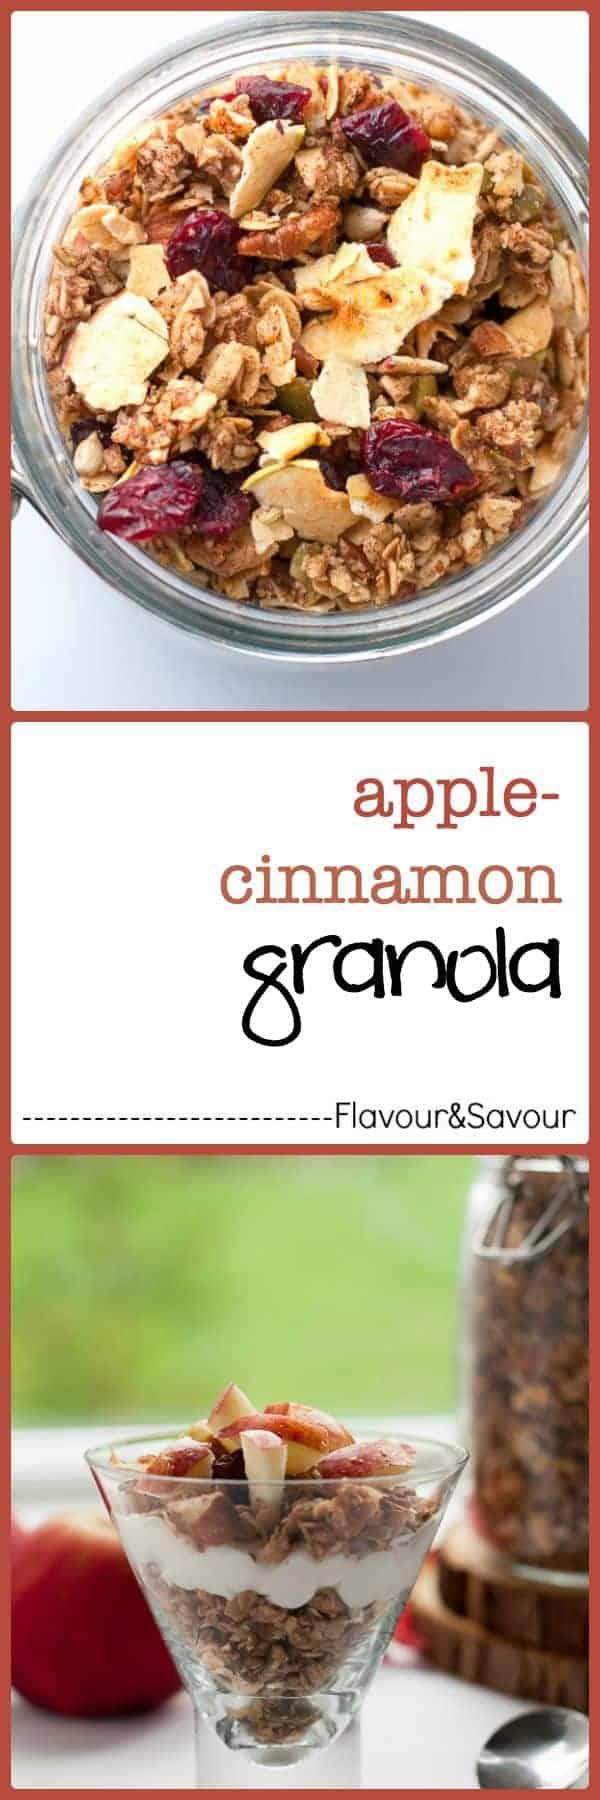 Apple Cinnamon Granola. Learn to make healthy apple cinnamon granola ...